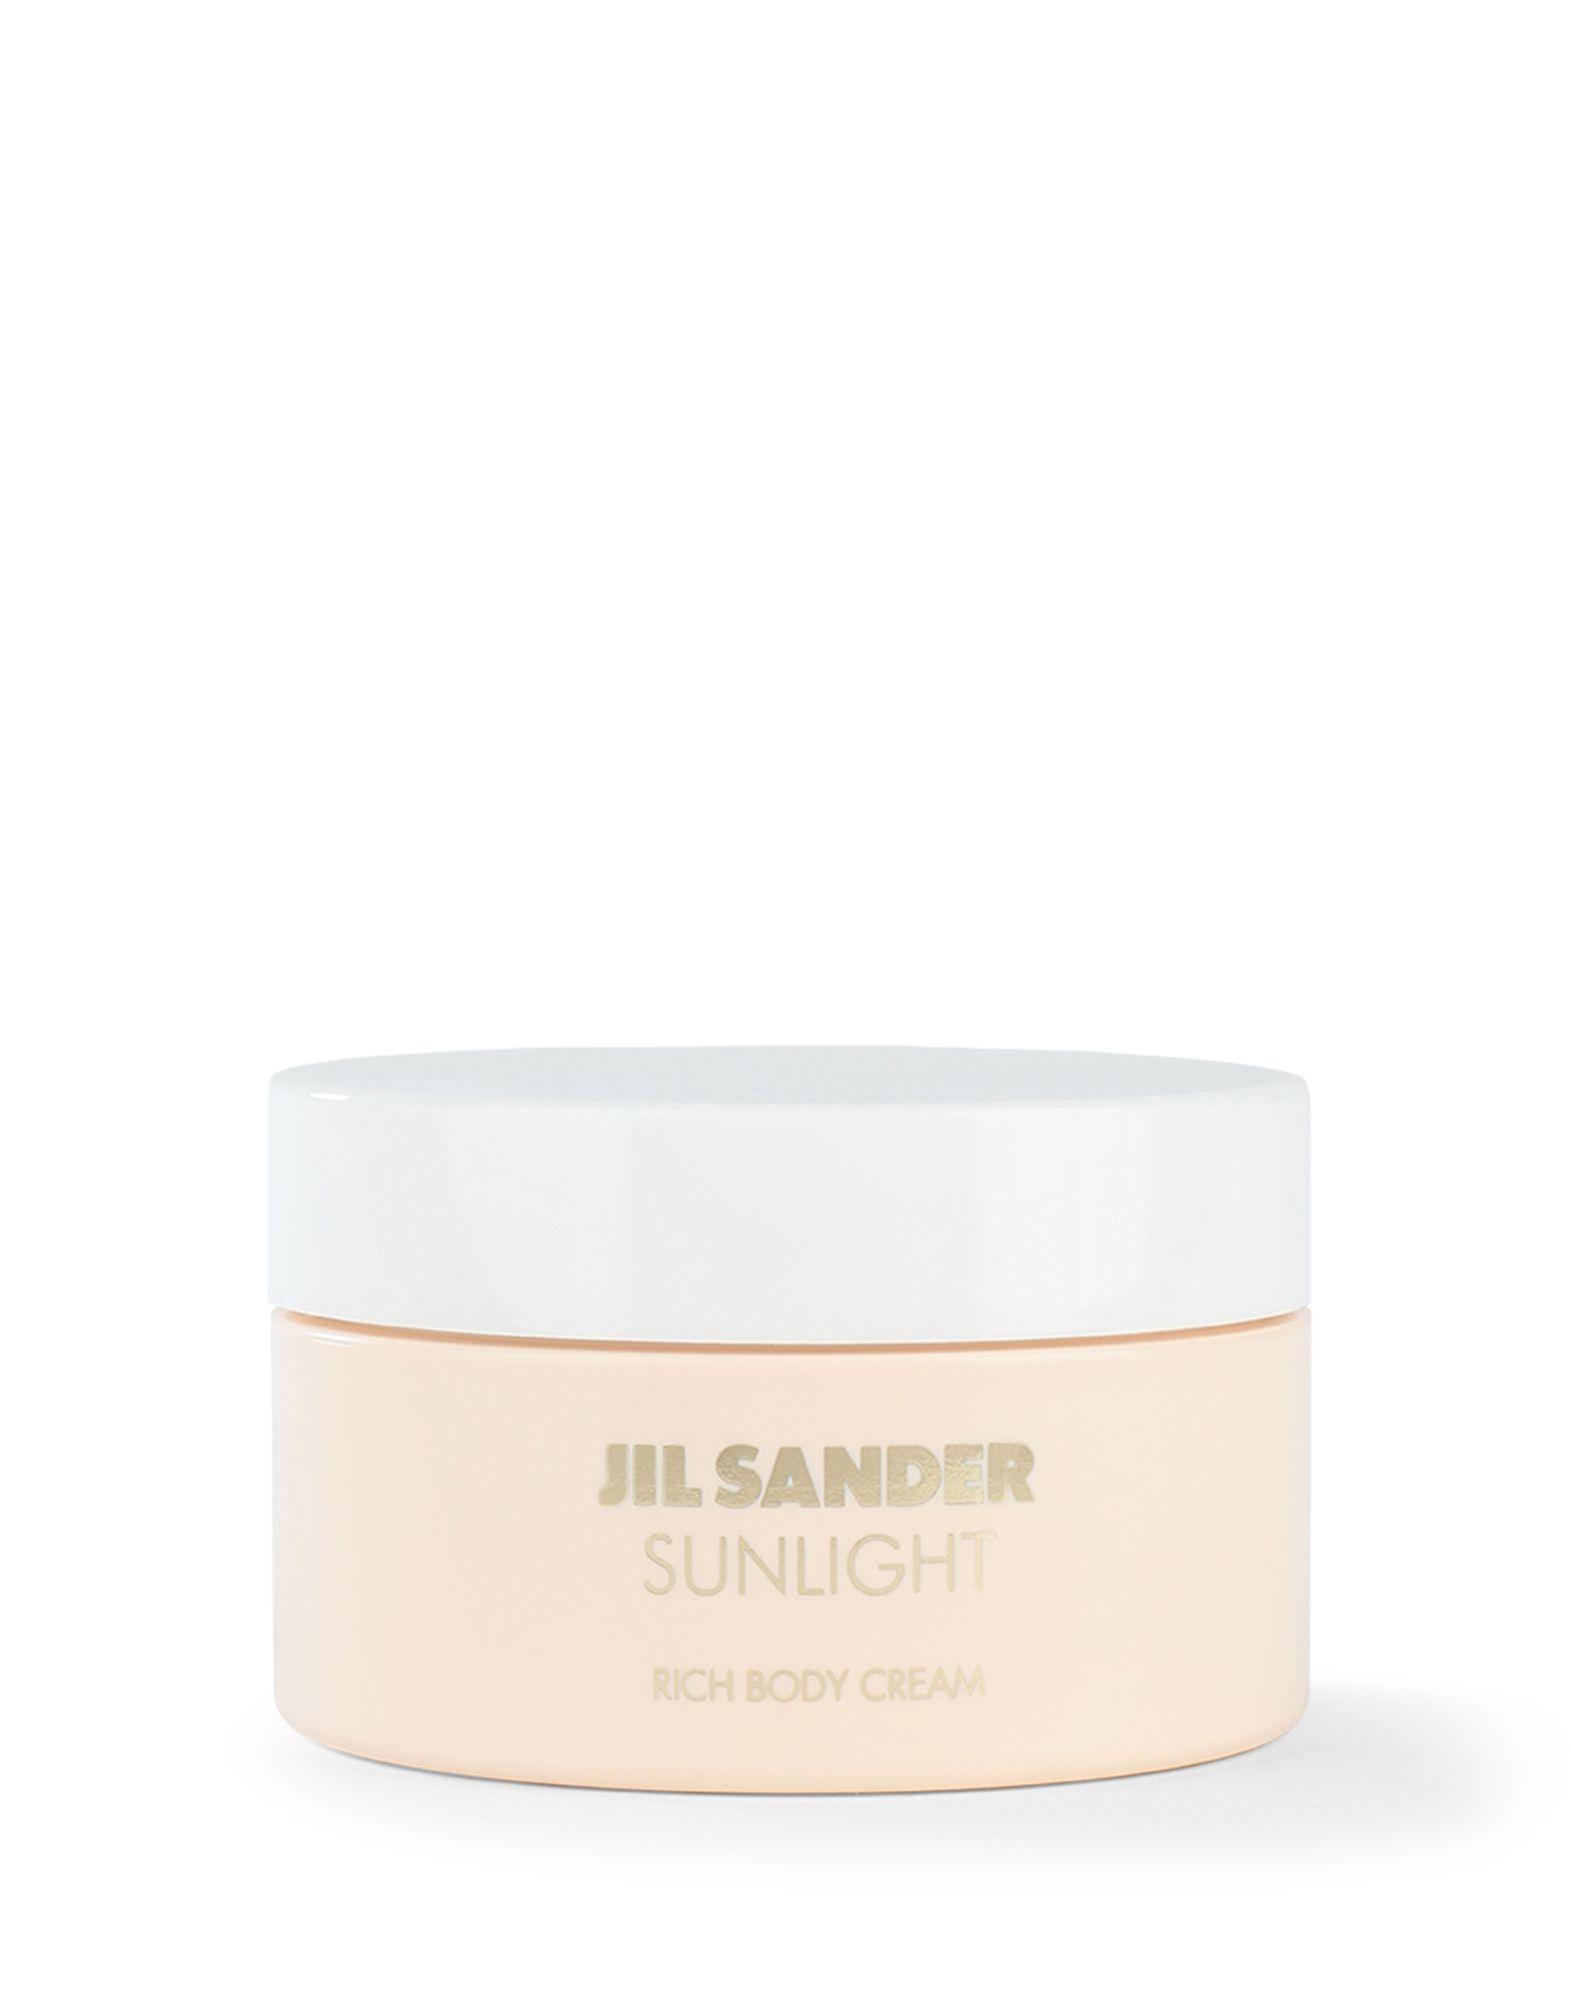 SUNLIGHT - JIL SANDER Online Store